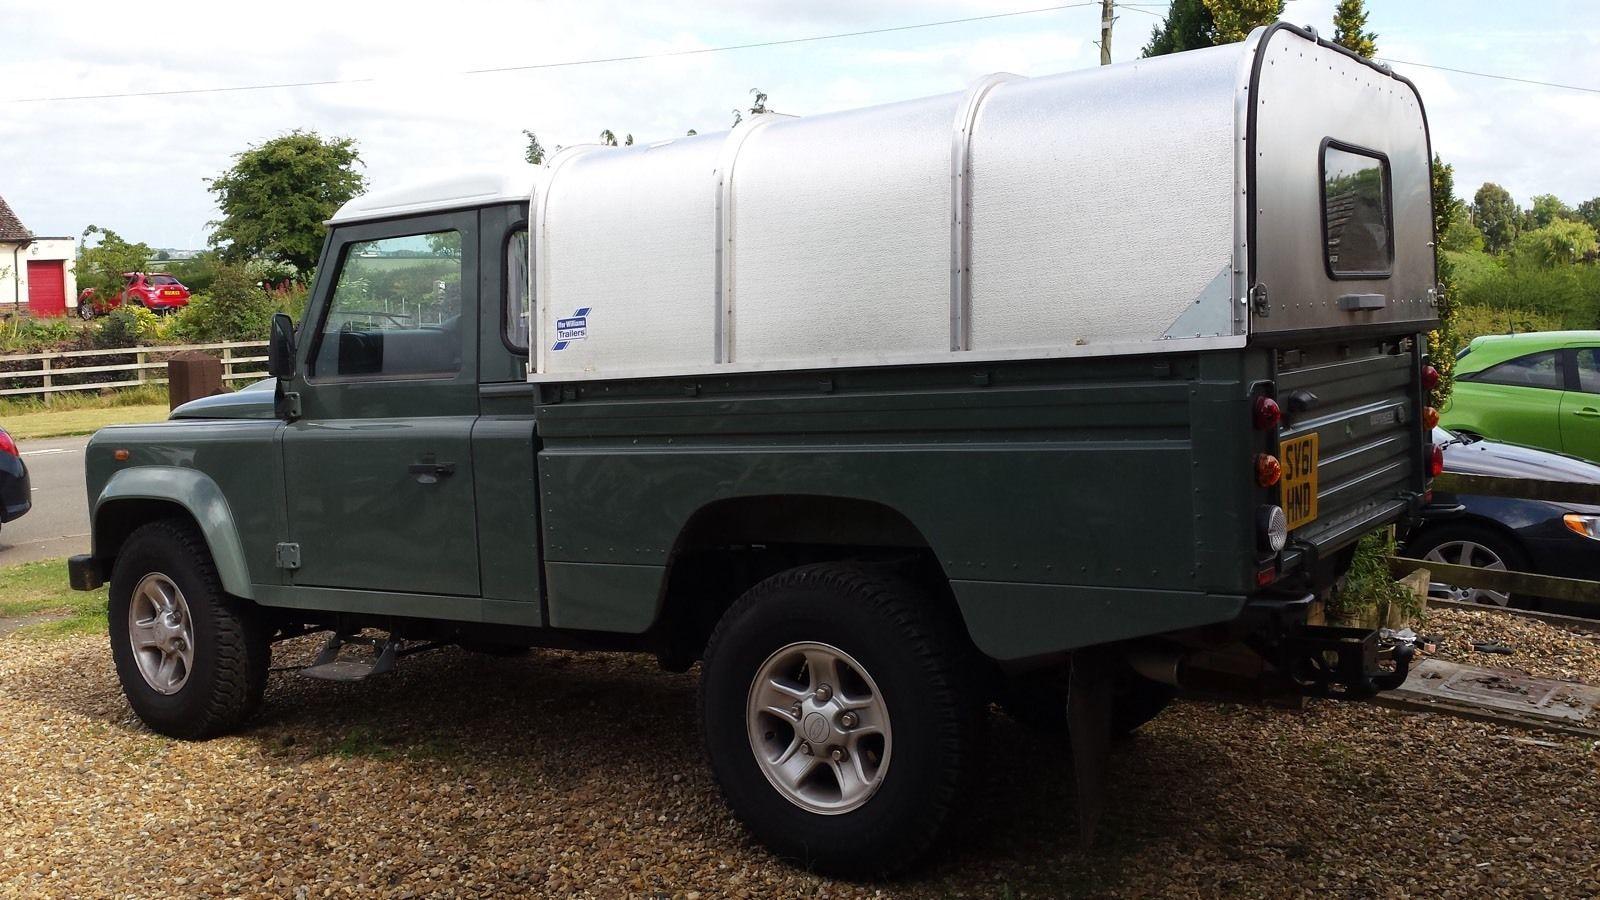 Land Rover 110 Fuse Box Explained Wiring Diagrams Defender Layout Ebay Trusted Diagram Radio Ifor Williams Canopy Aluminium